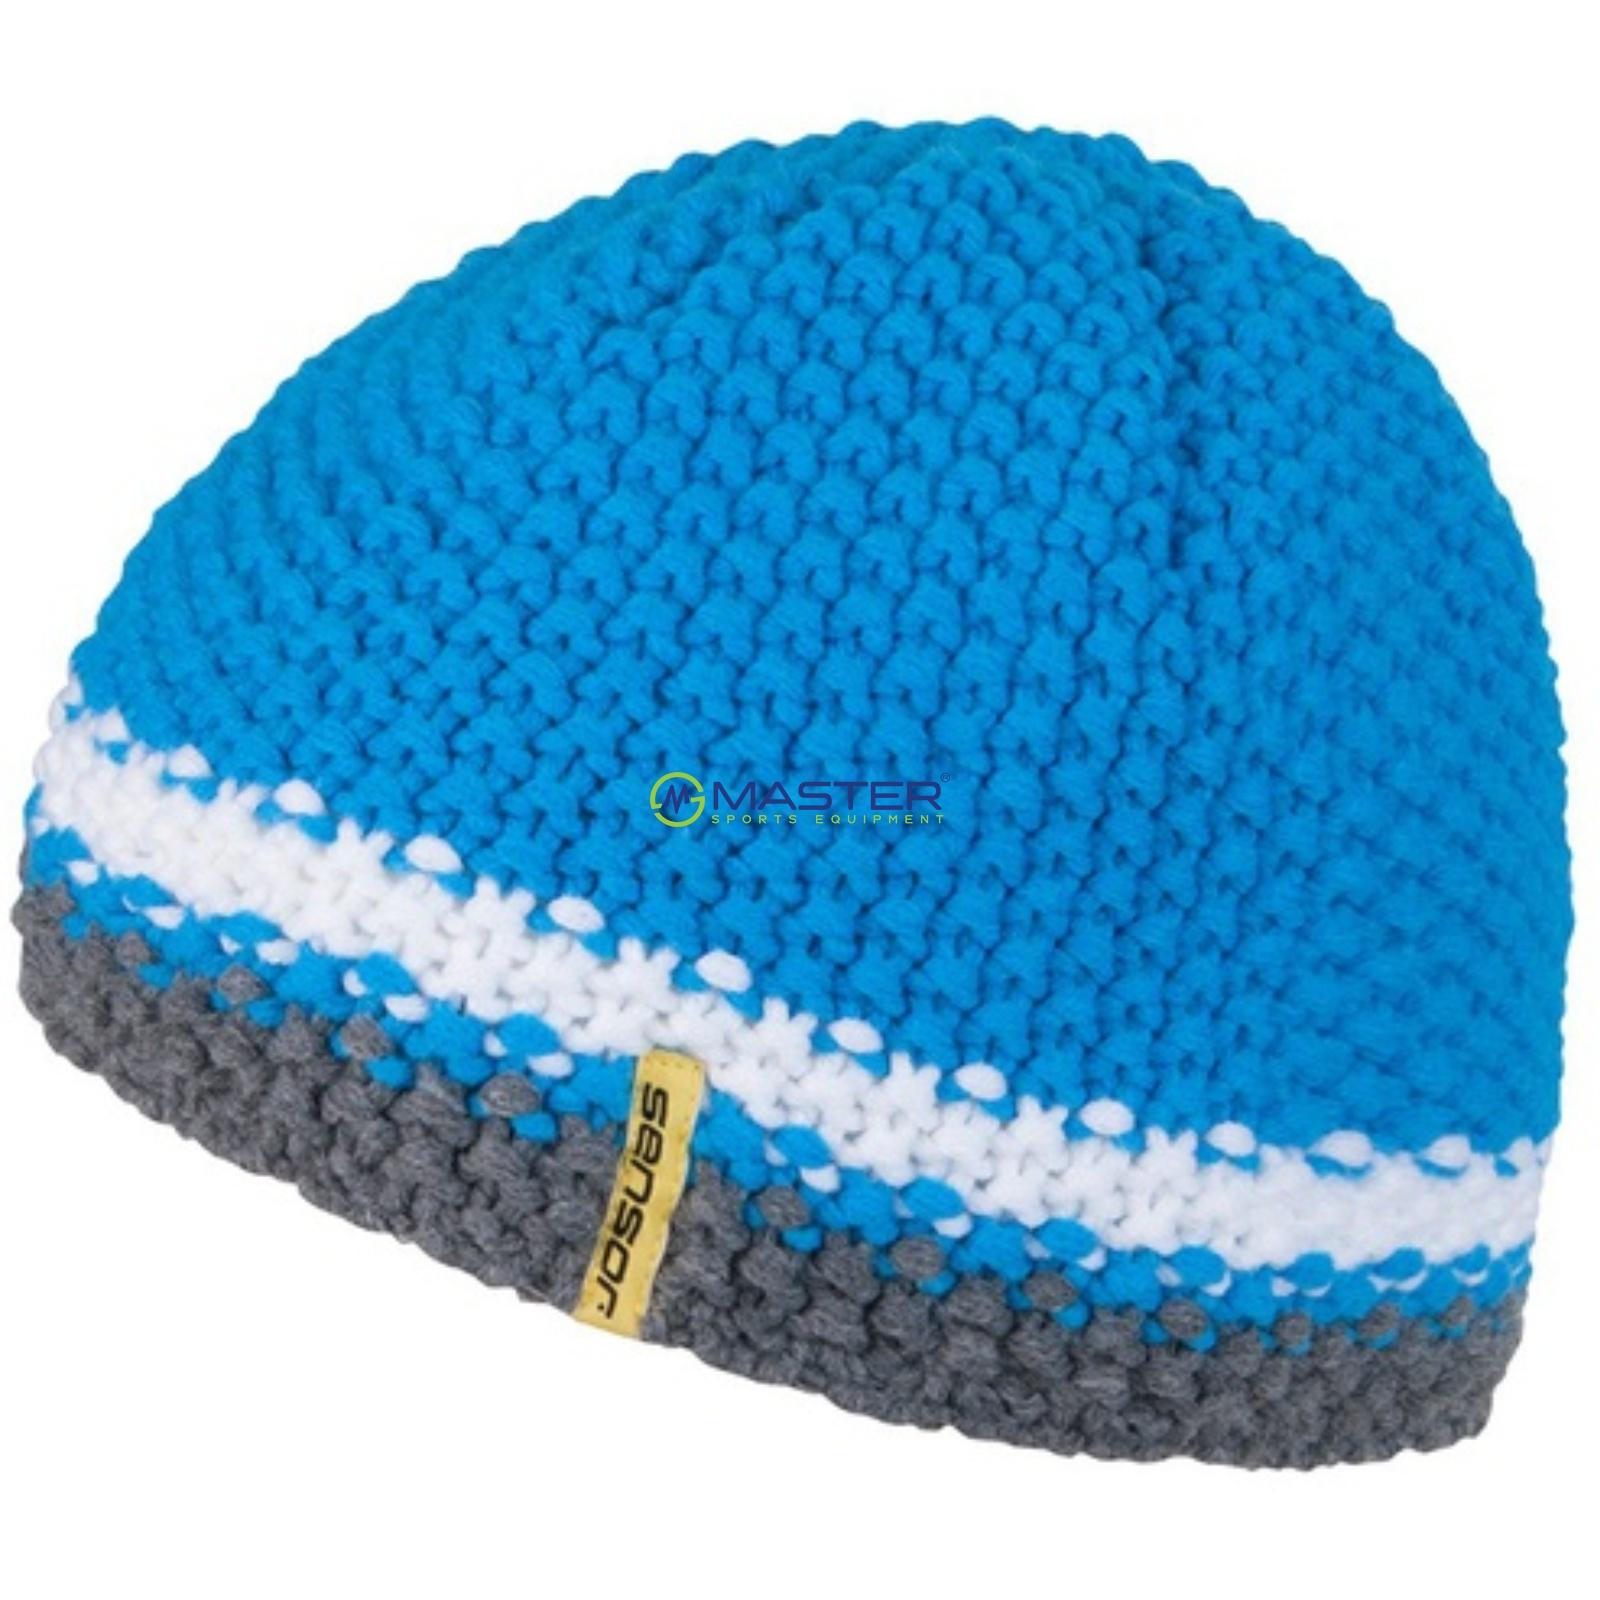 d493661d0b6 Čepice SENSOR Fresh modrá